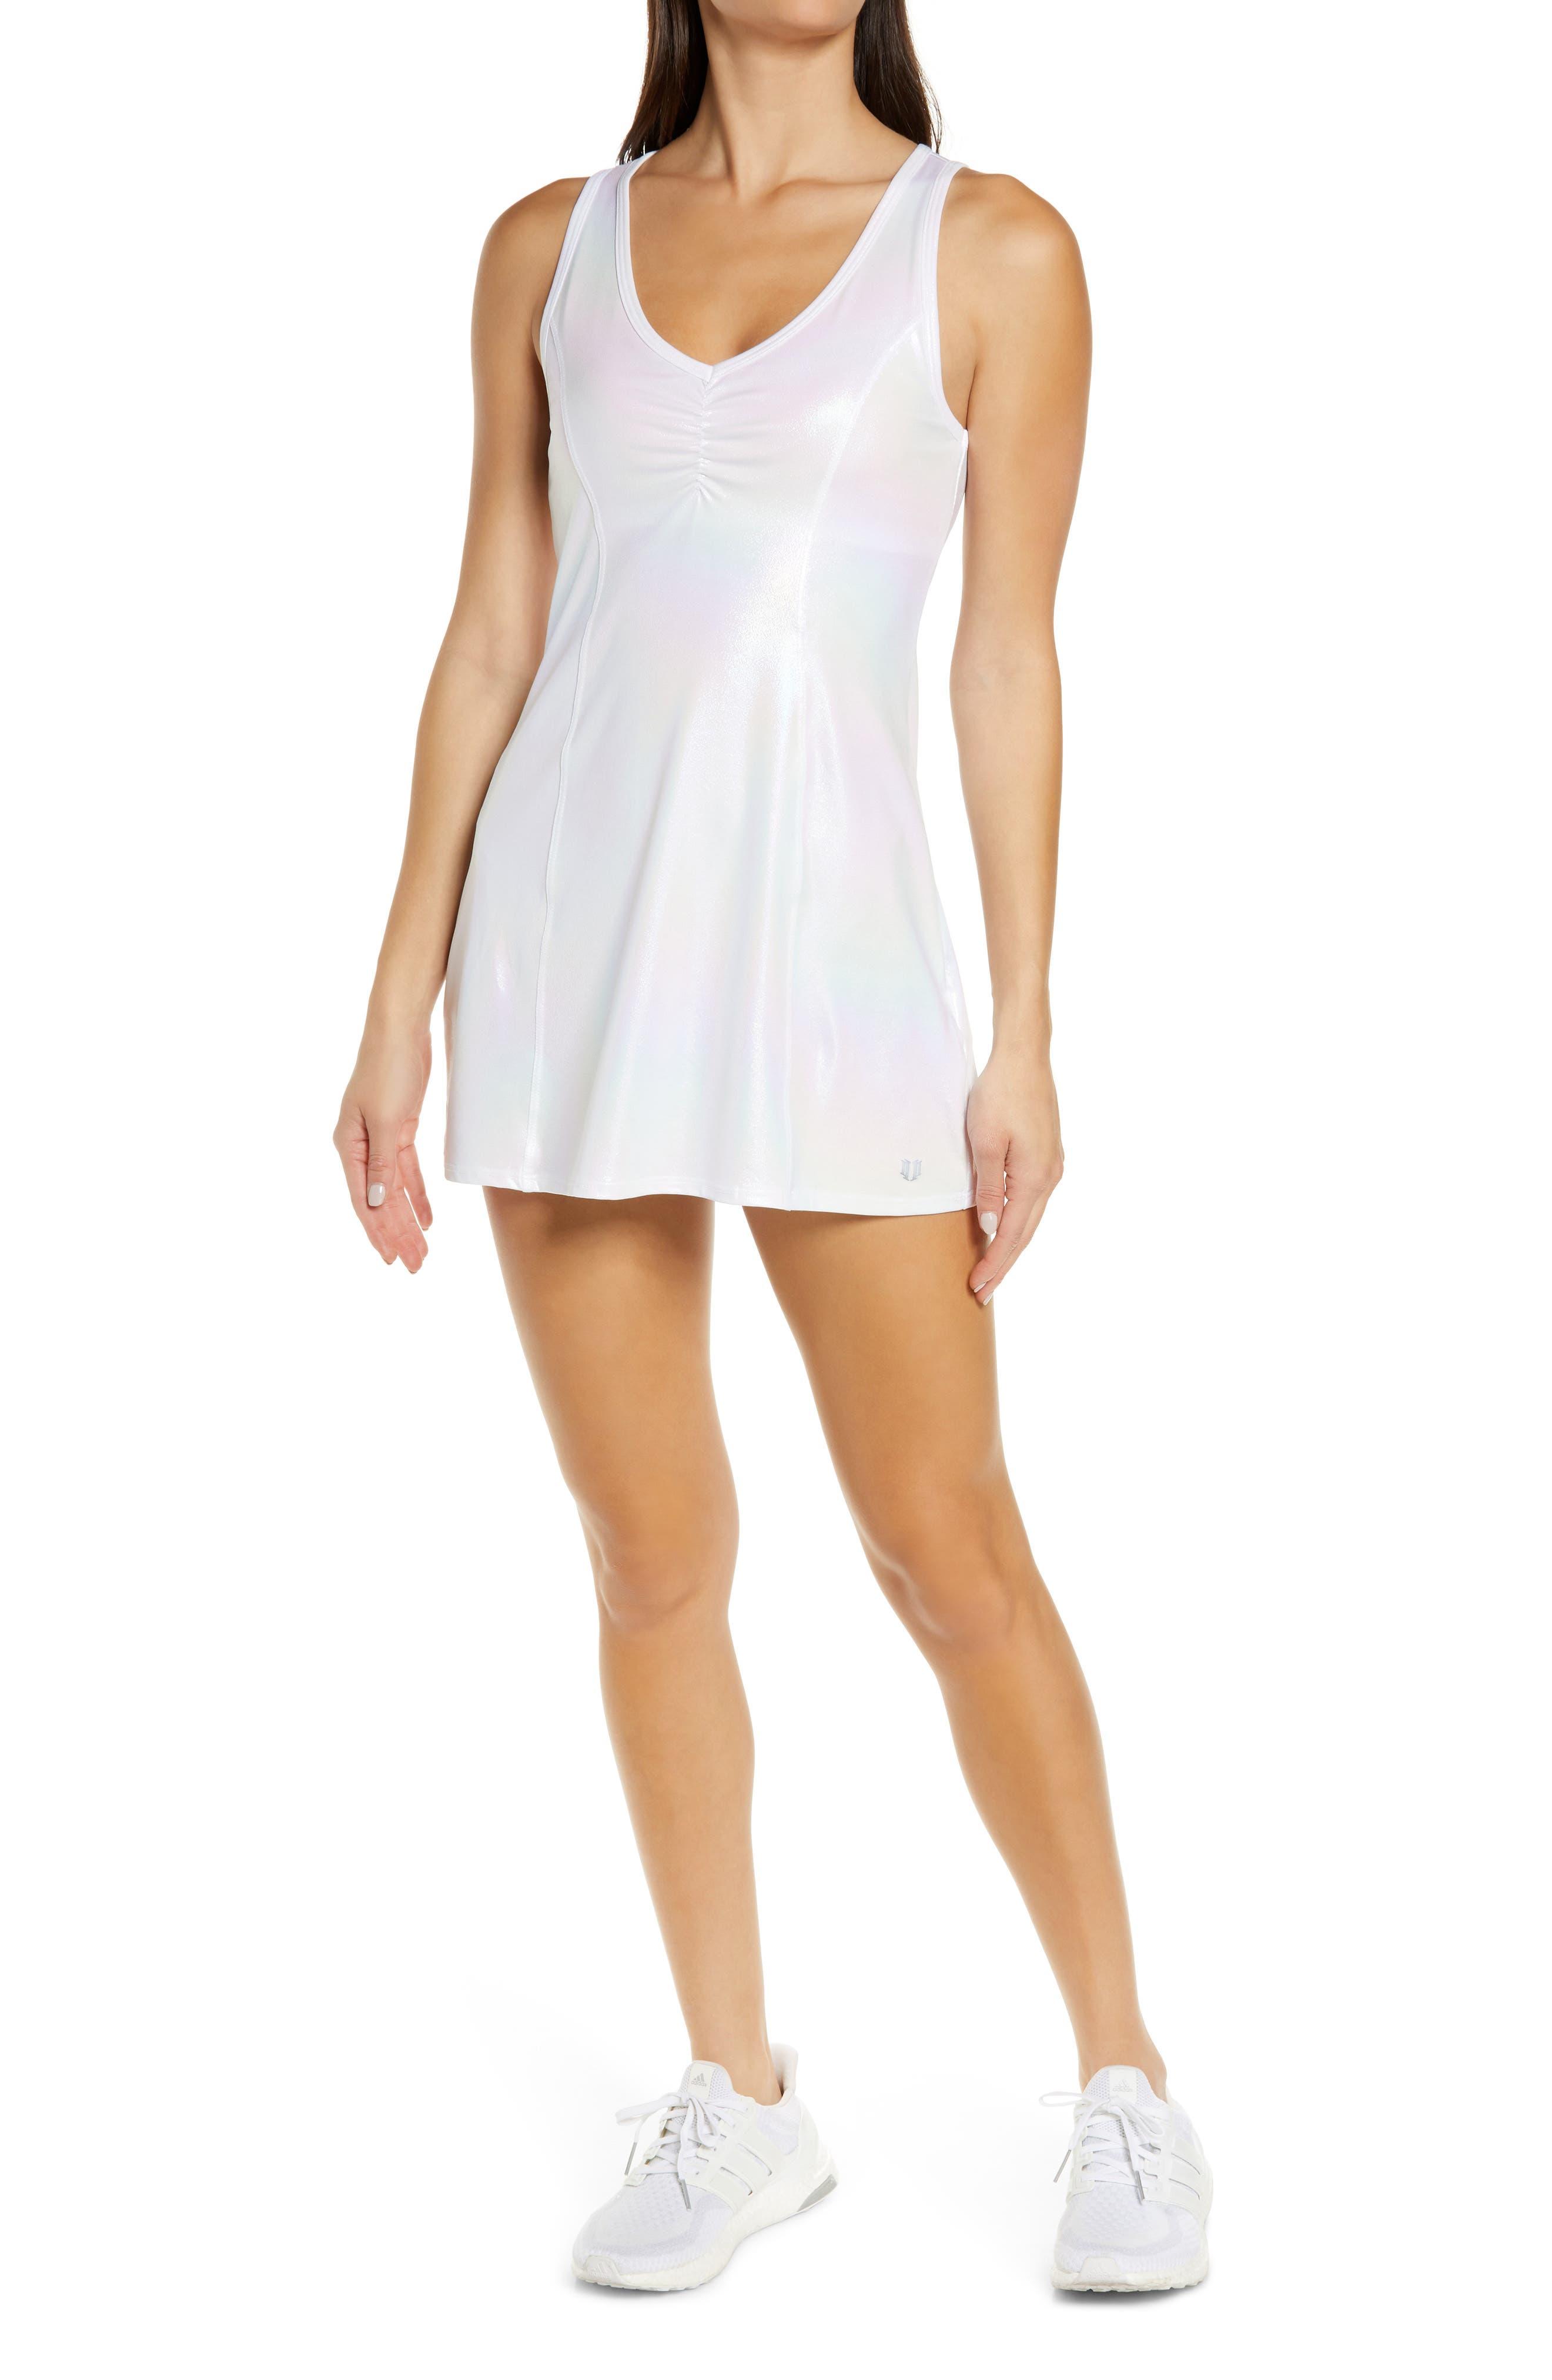 Starr Ruched Tennis Dress